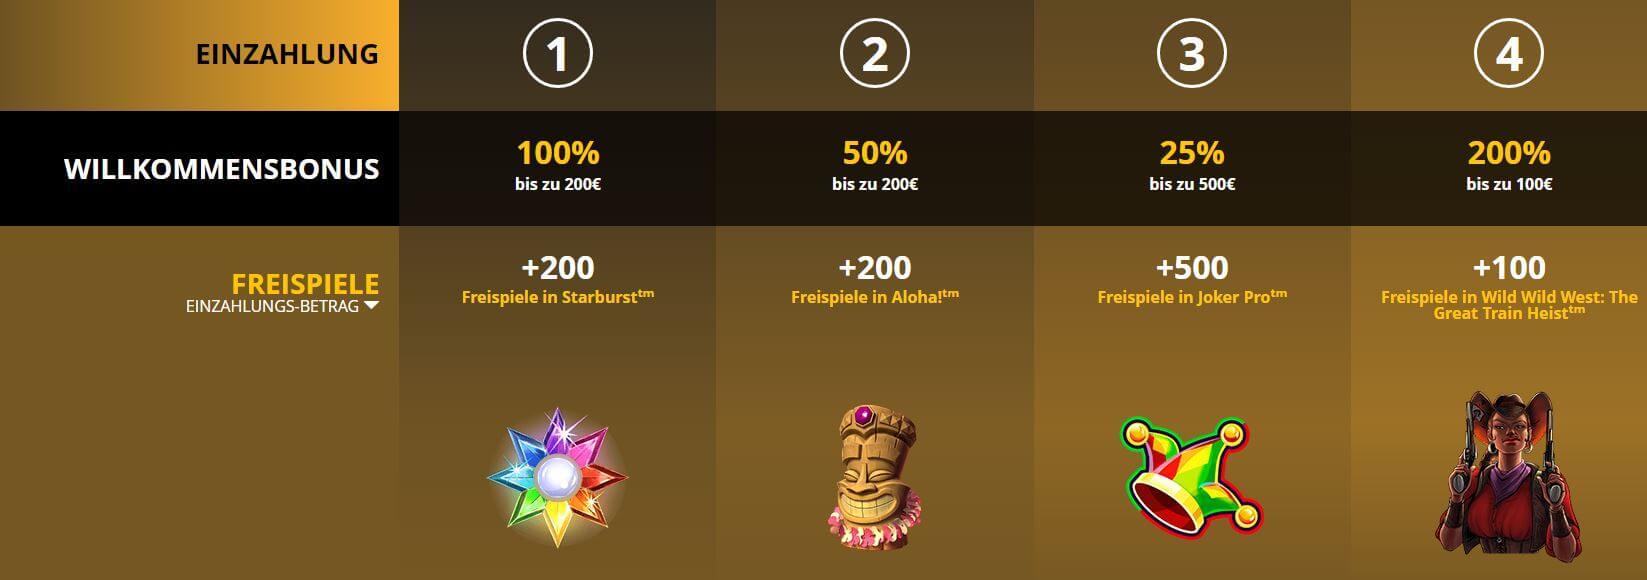 lvbet_casino_bonus_deutschland